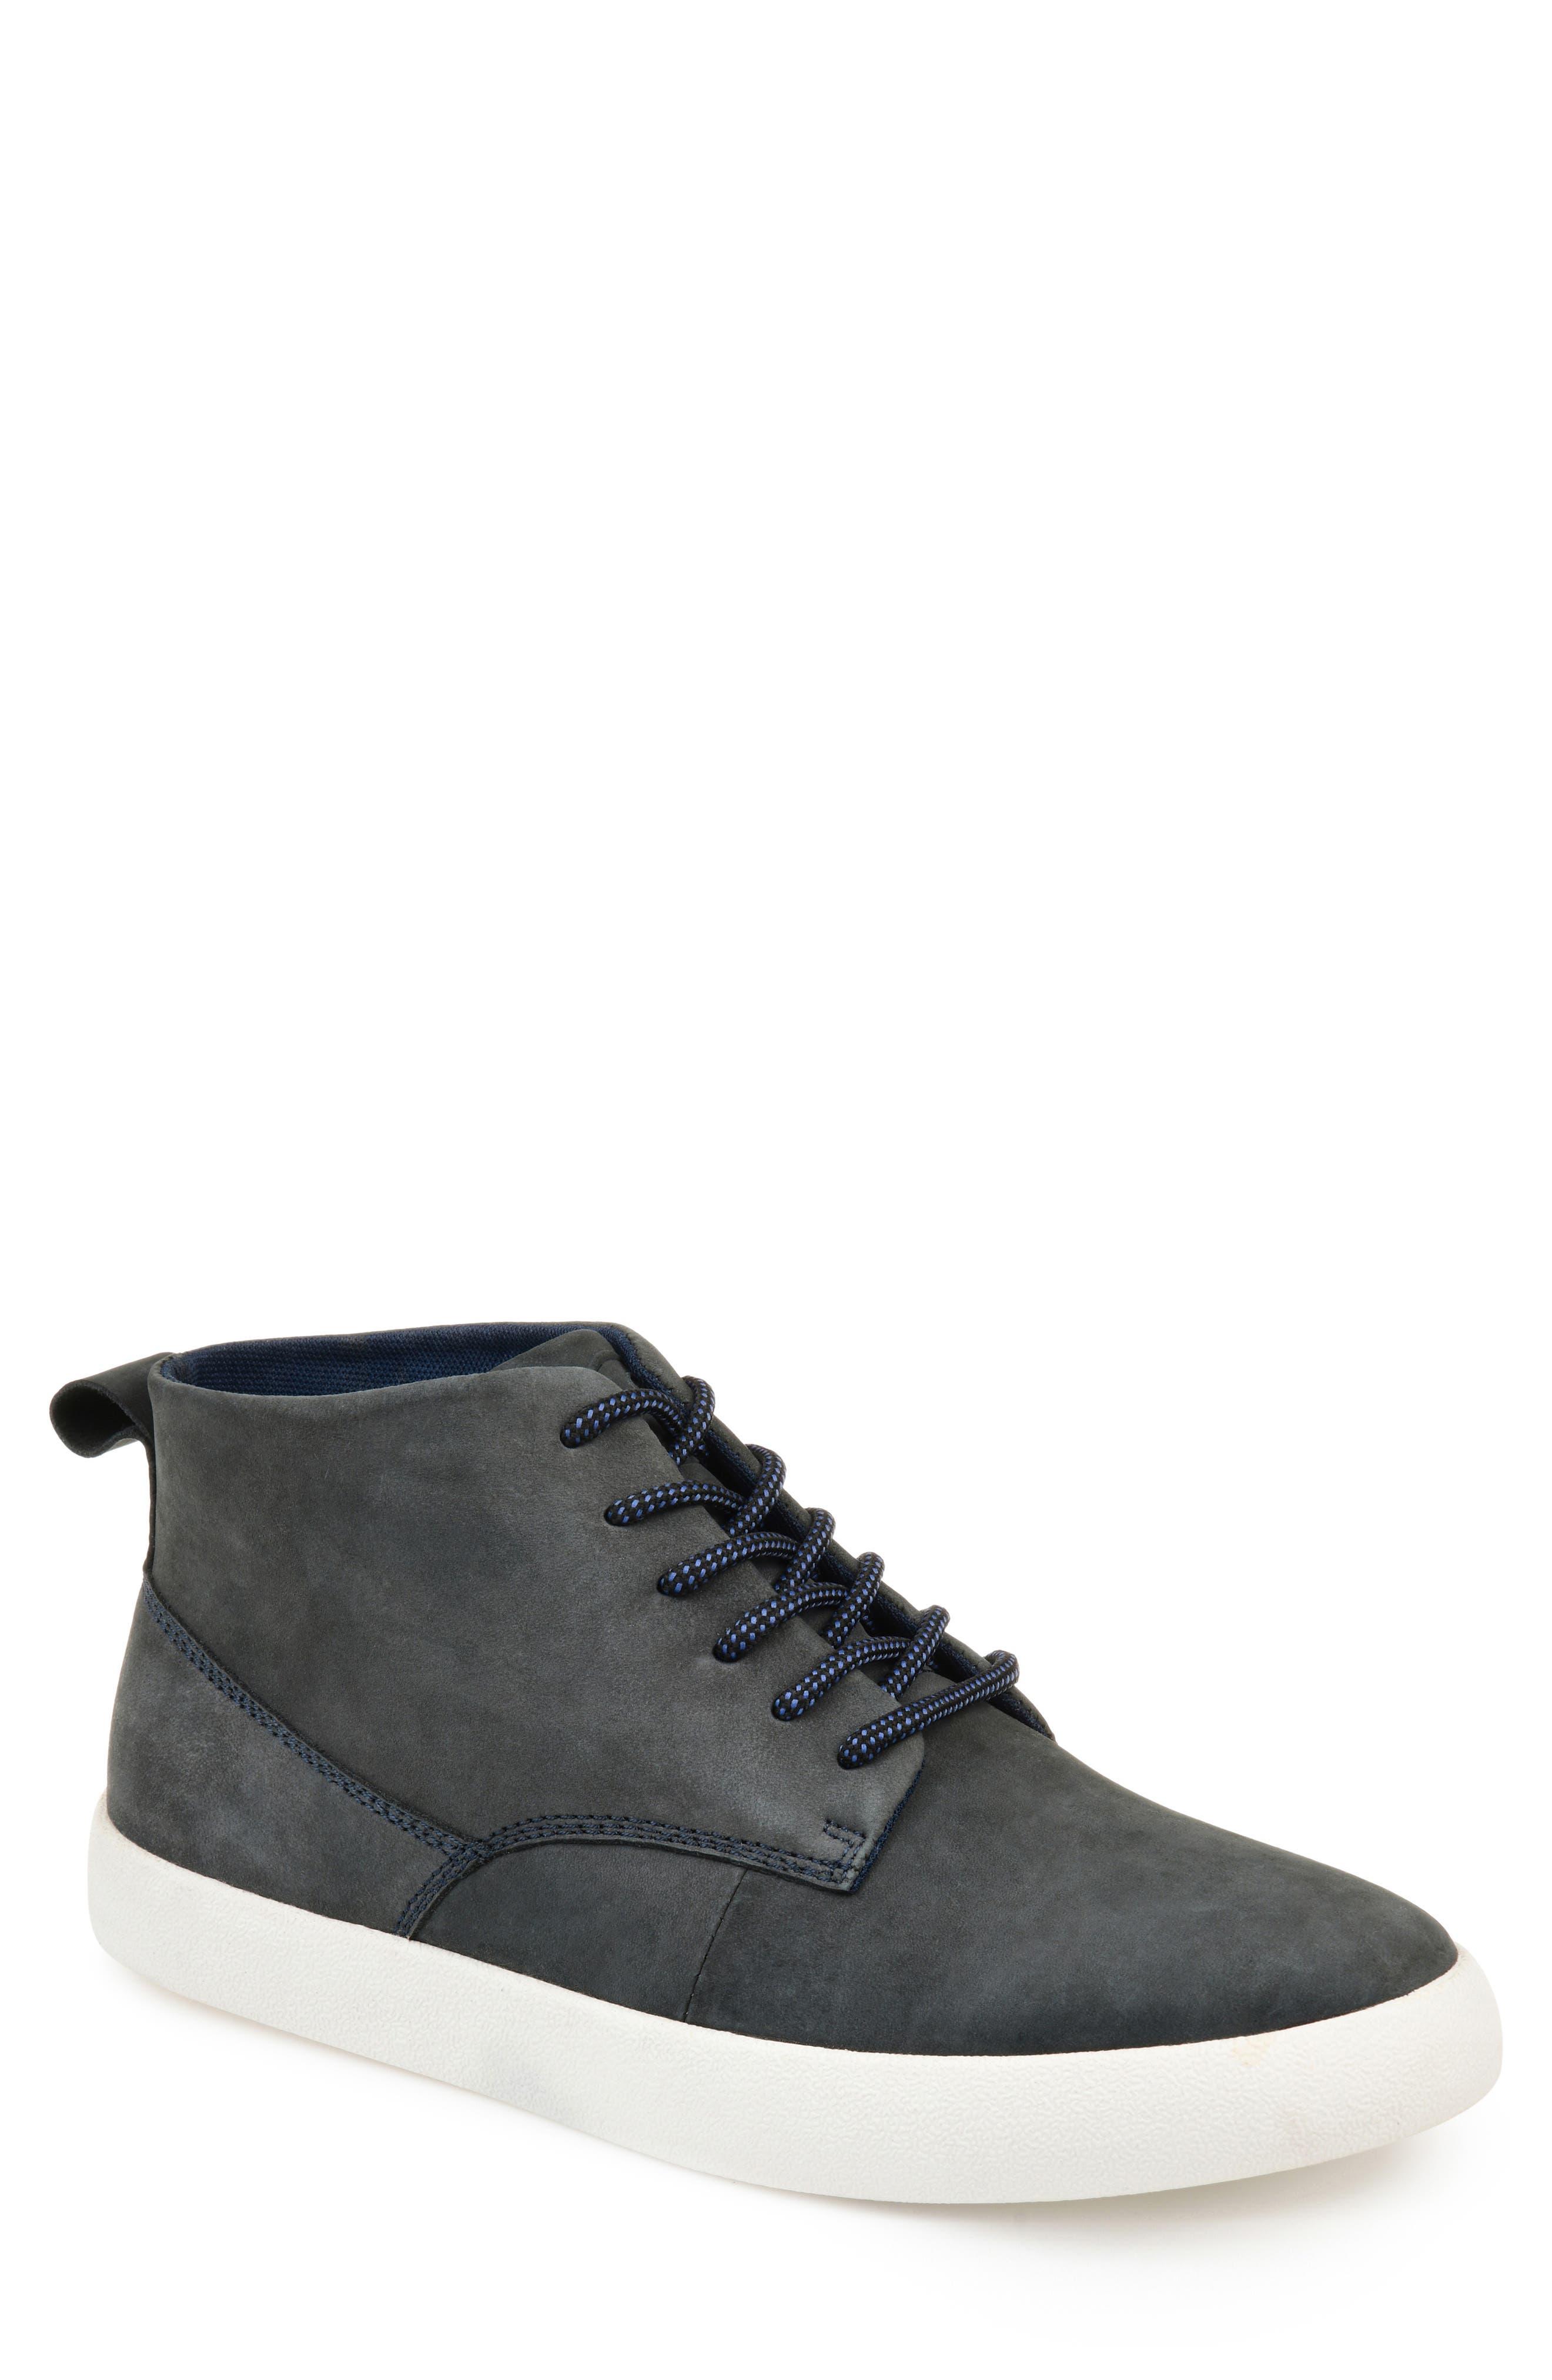 Thomas And Vine Damon Chukka Sneaker- Grey